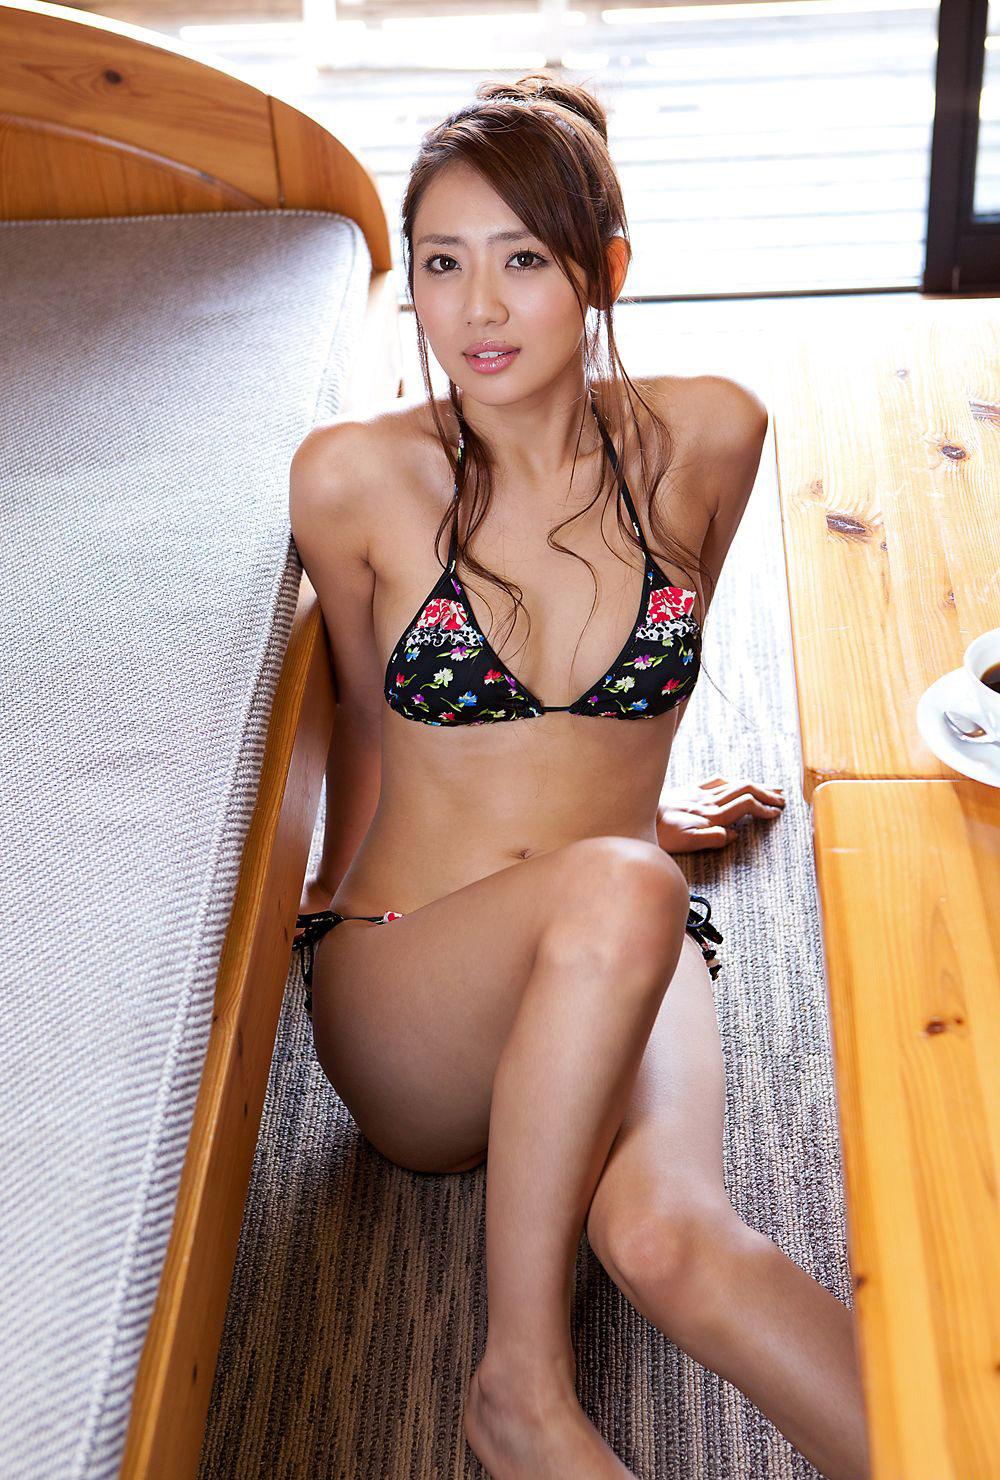 滝川綾 画像 32